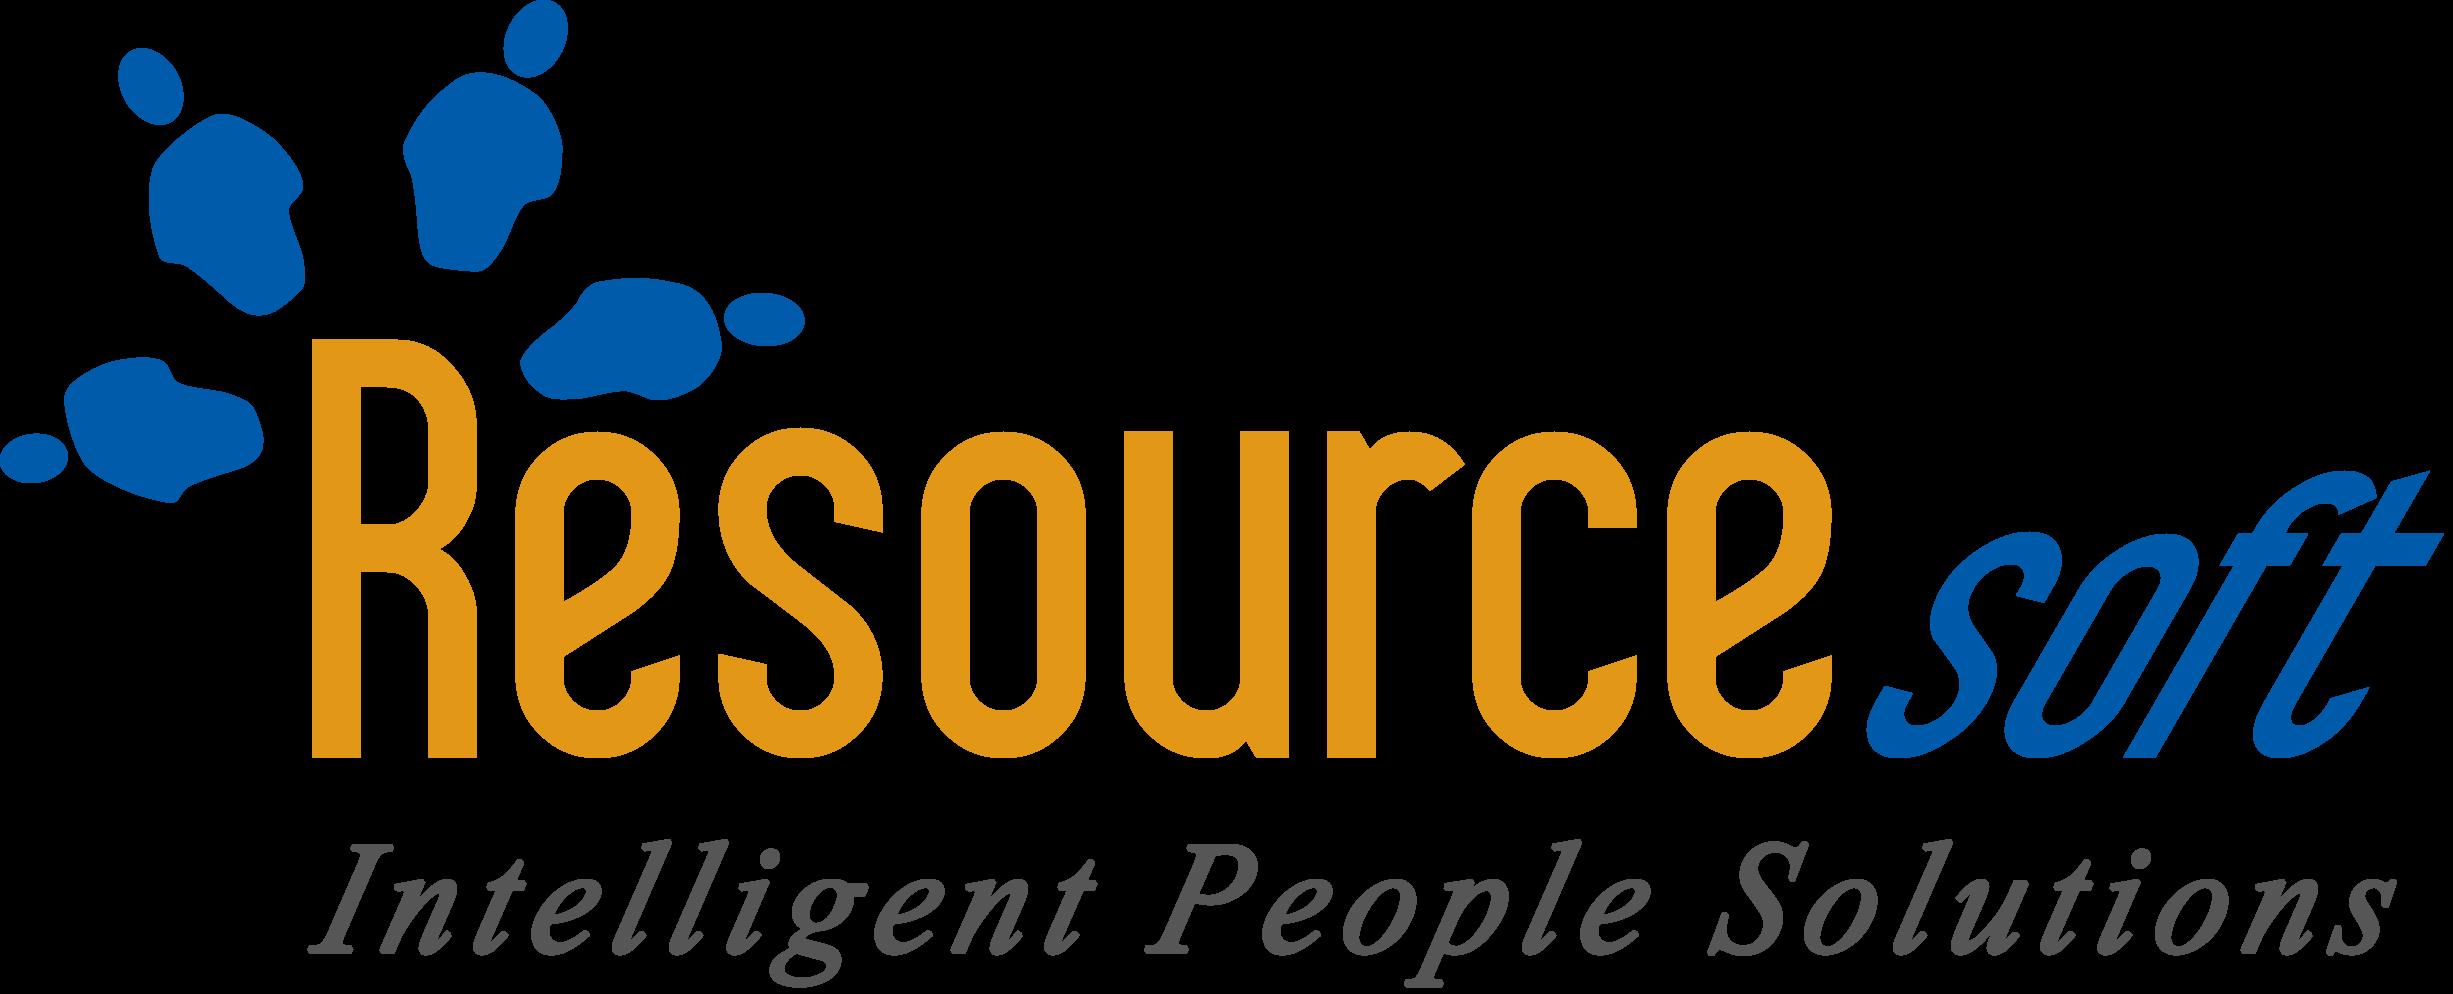 Resourcesoft, Inc.